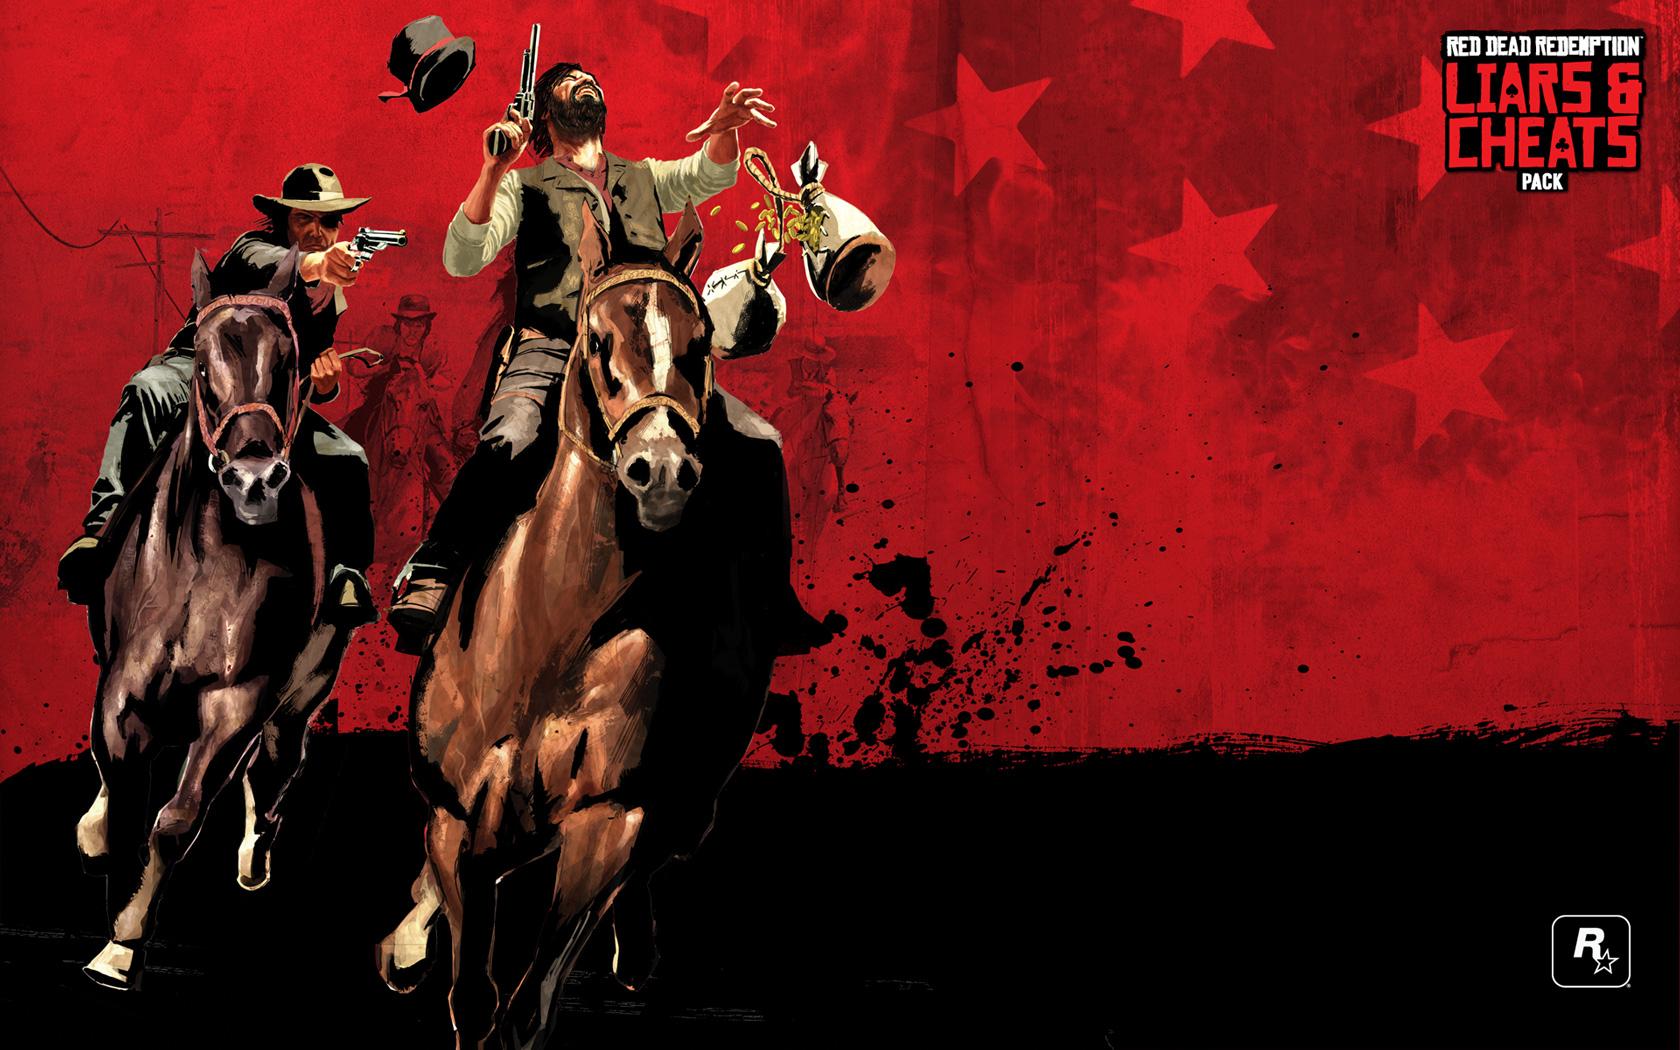 Free Red Dead Redemption Wallpaper in 1680x1050